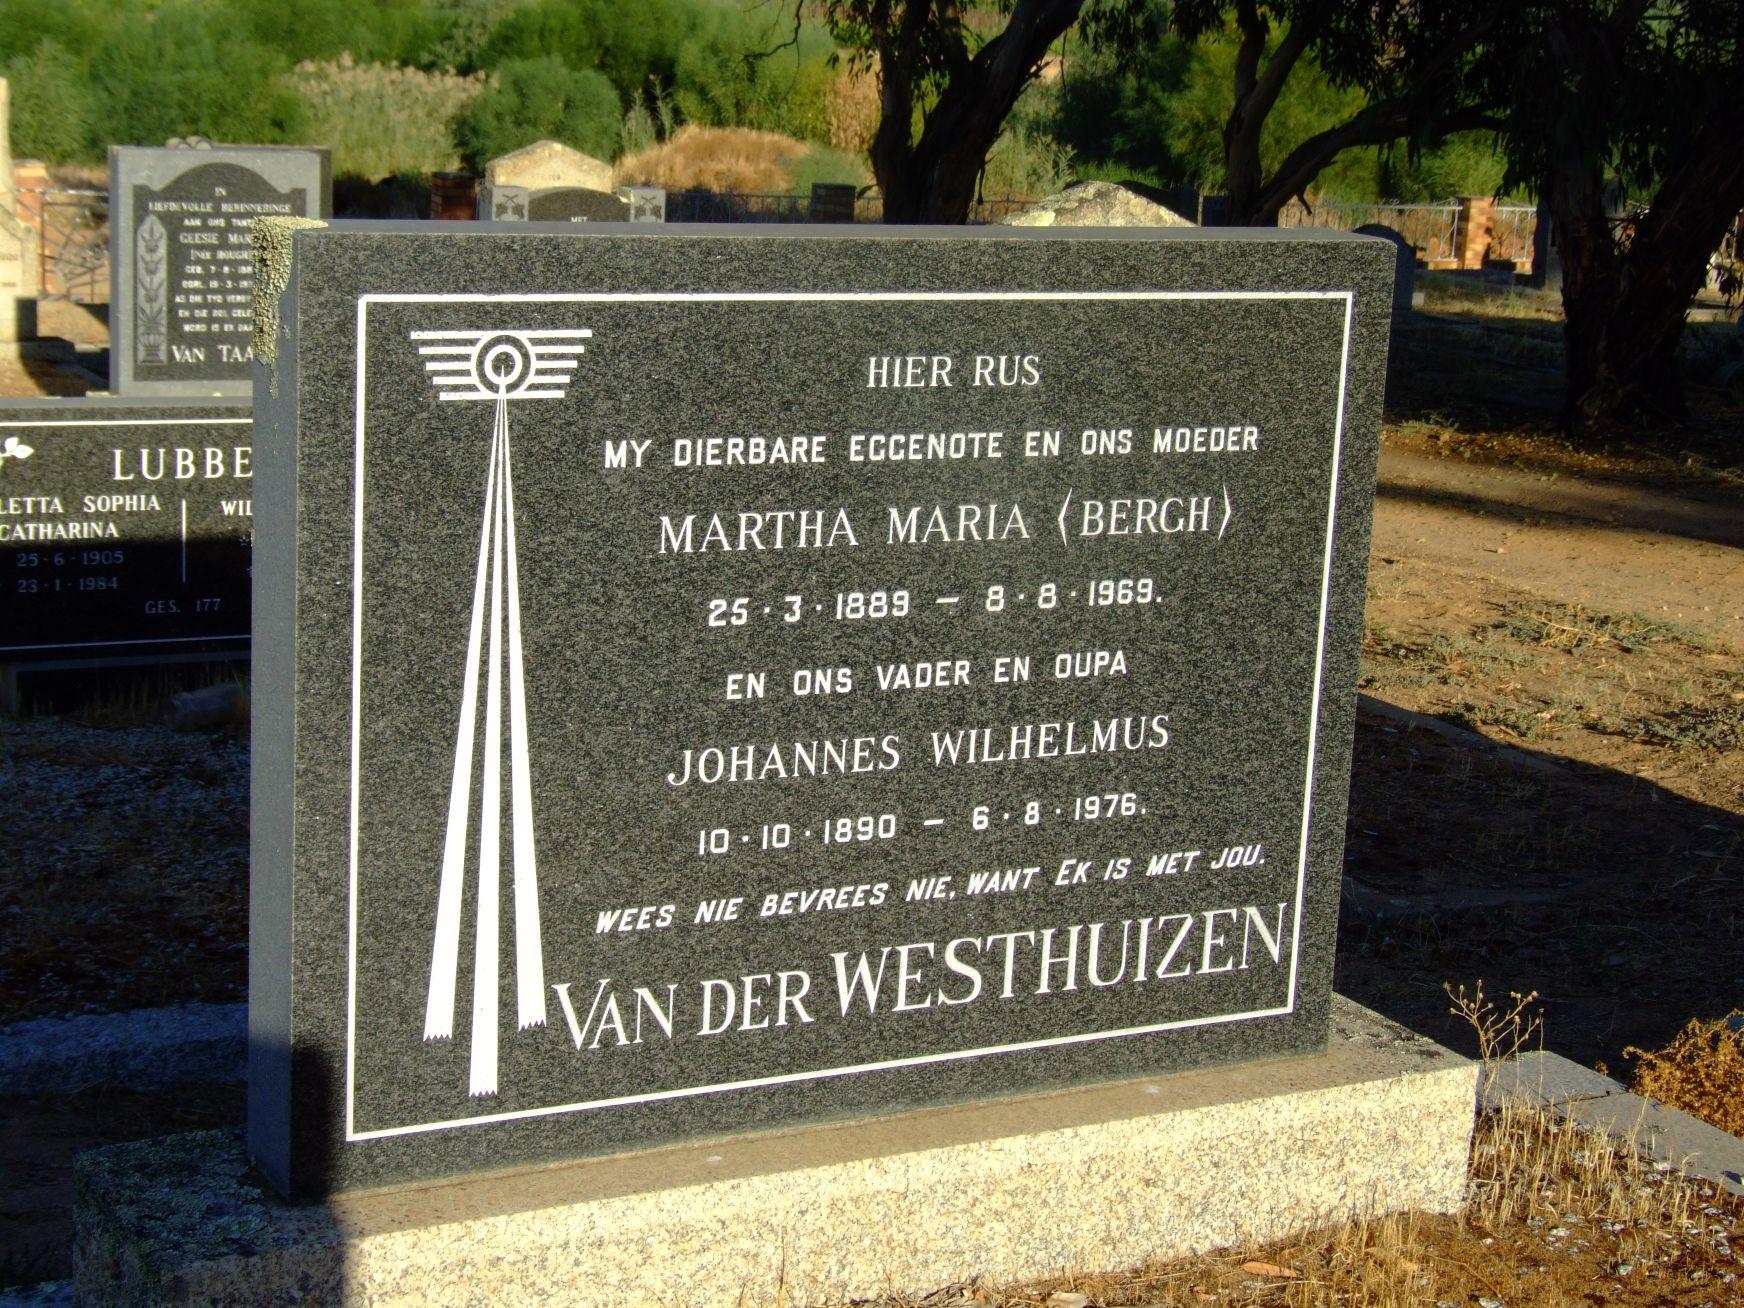 van der Westhuizen, Martha Maria (nee Bergh) and Van der Westhui